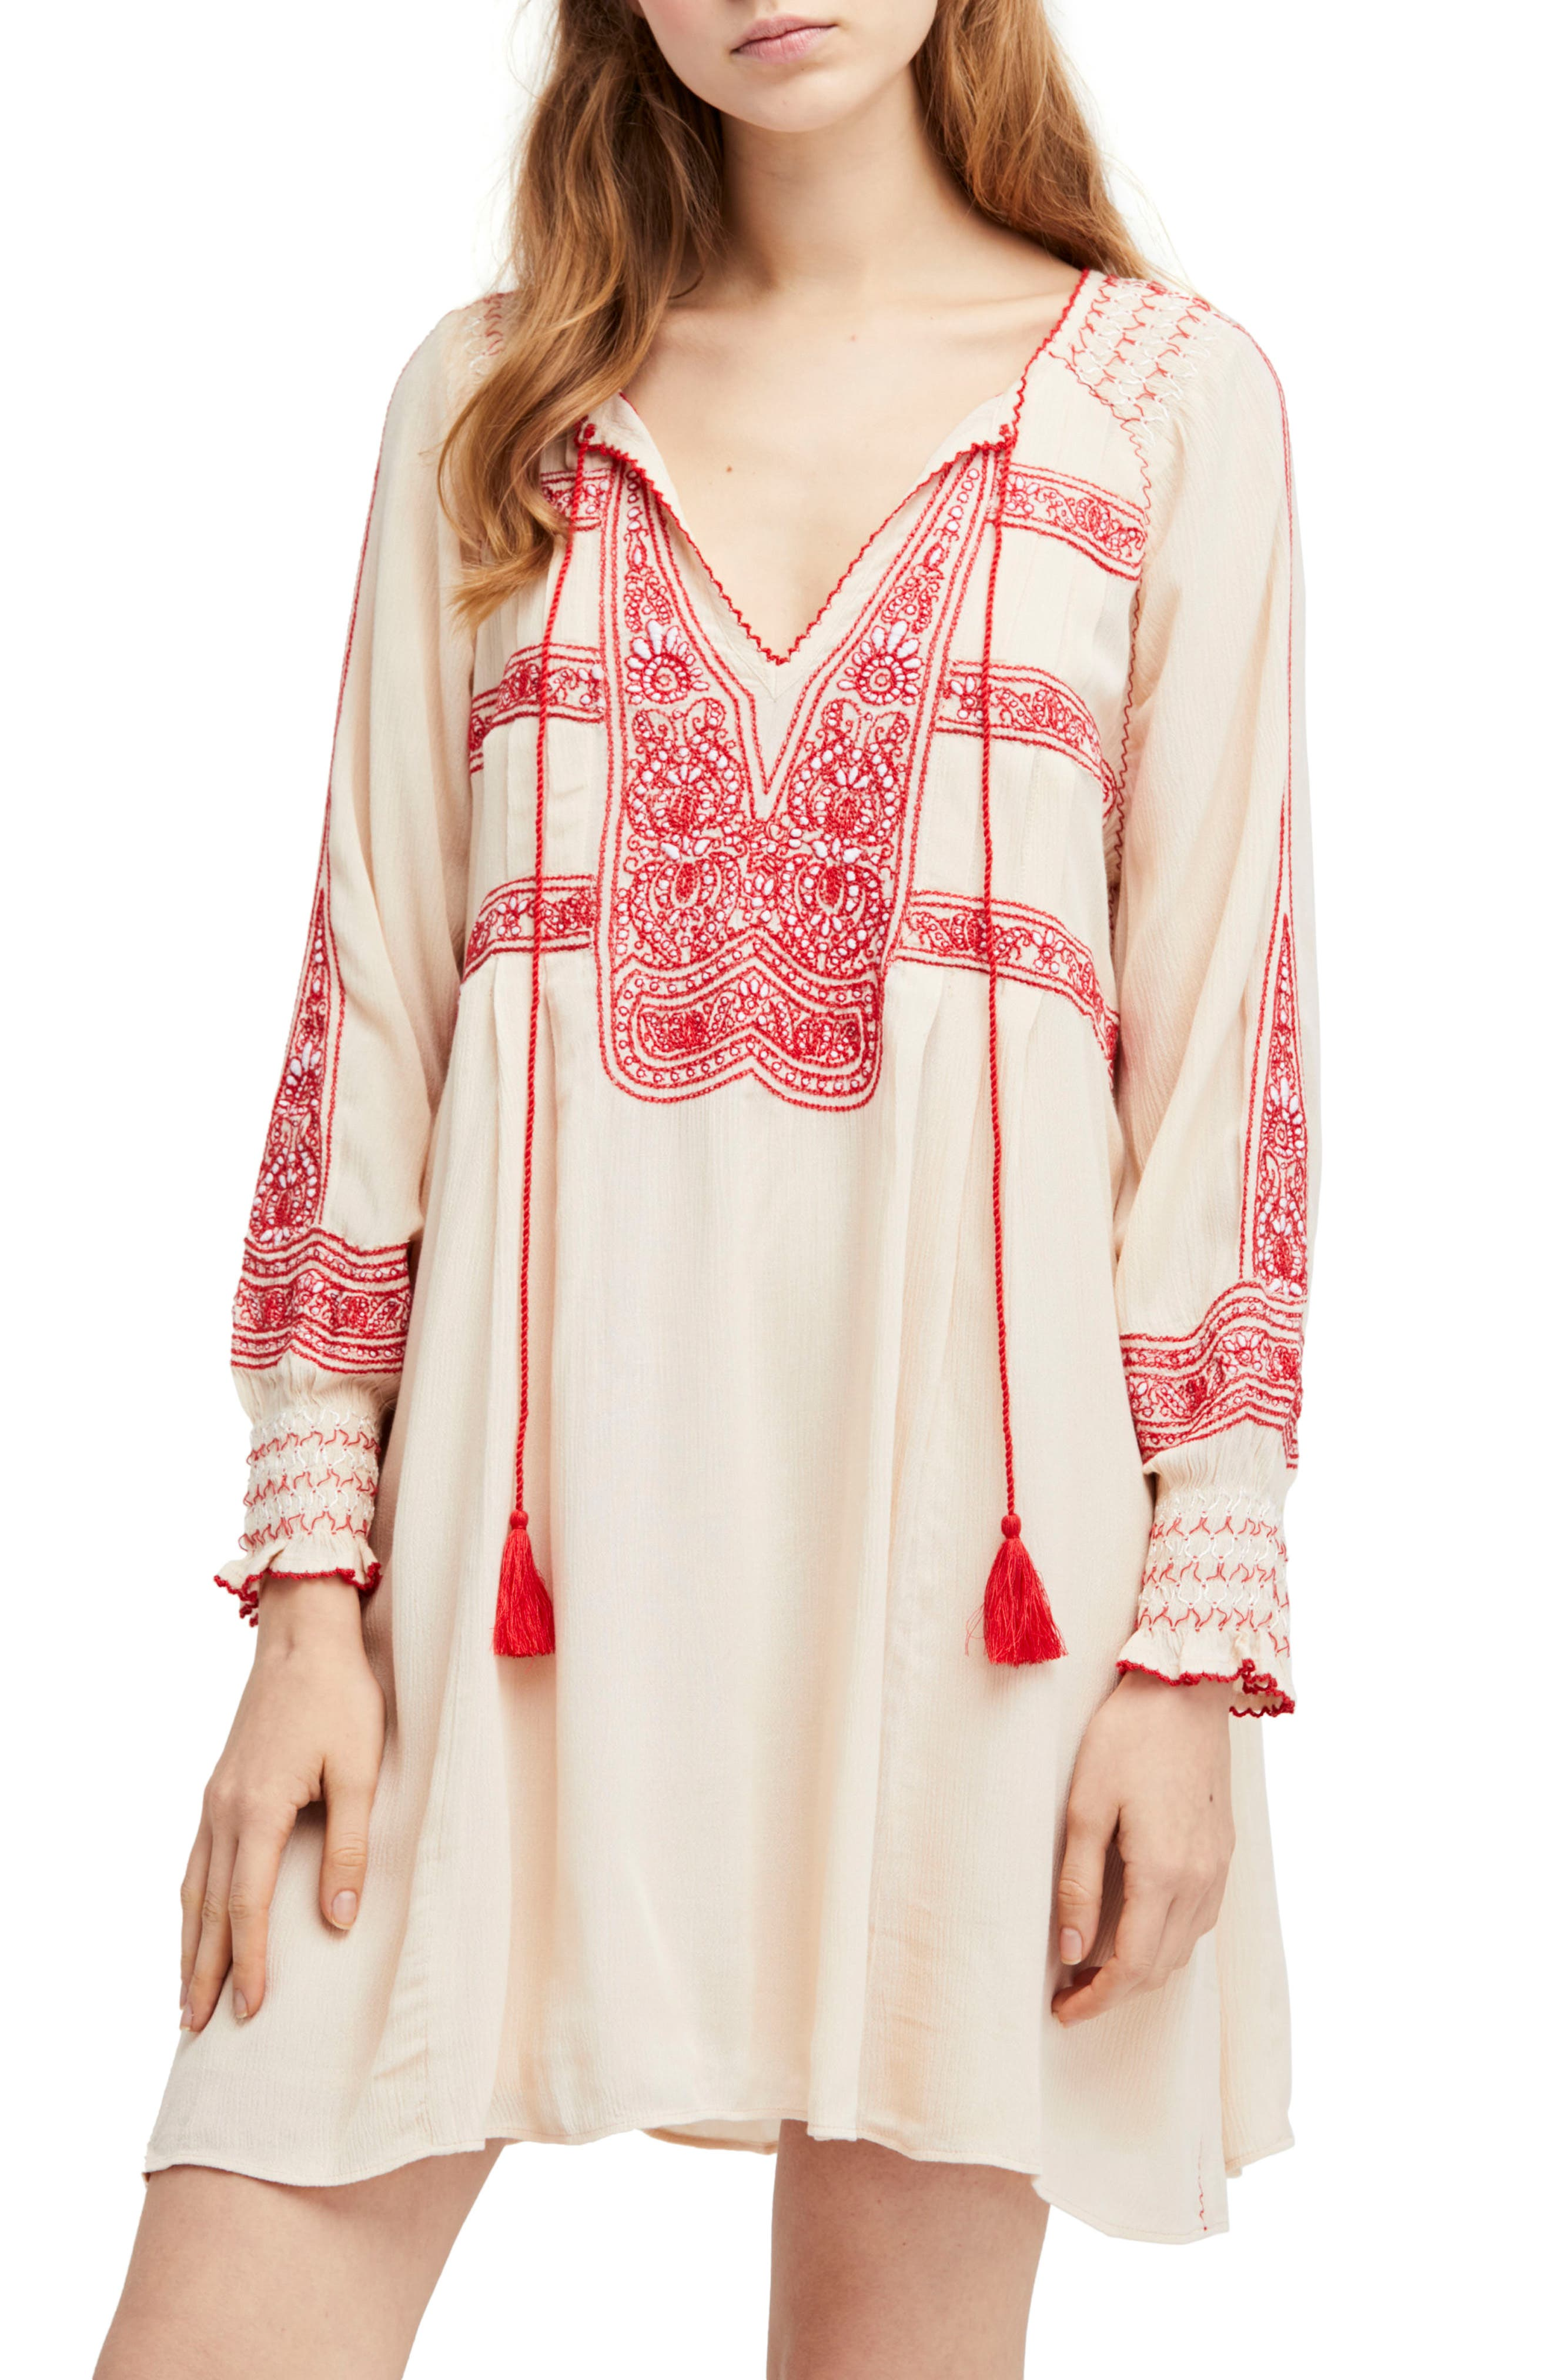 White Ivory Dress